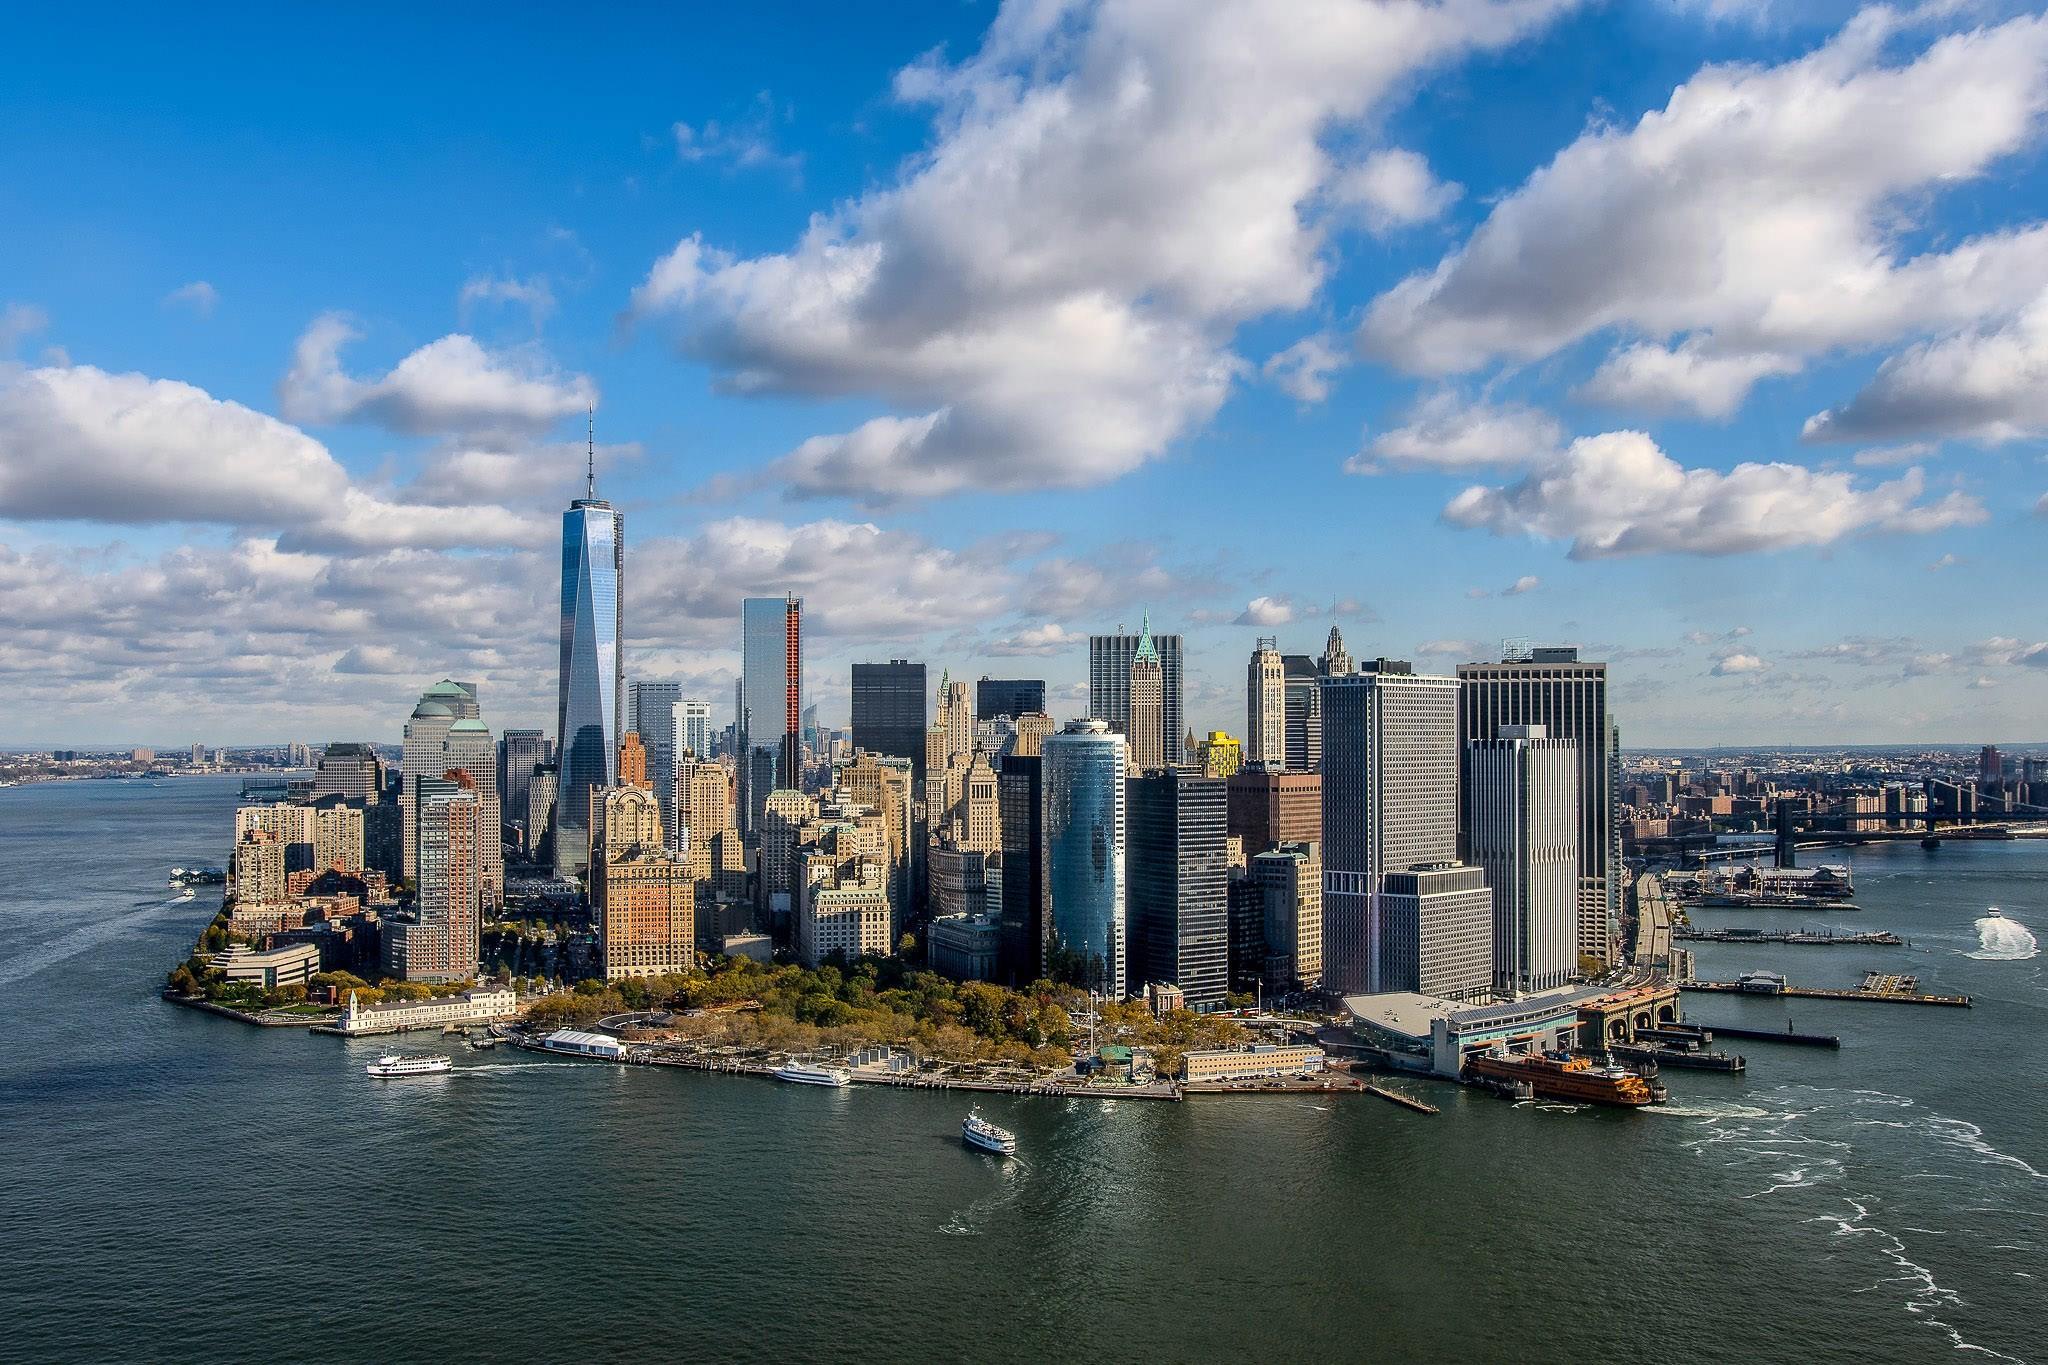 new york theme background images